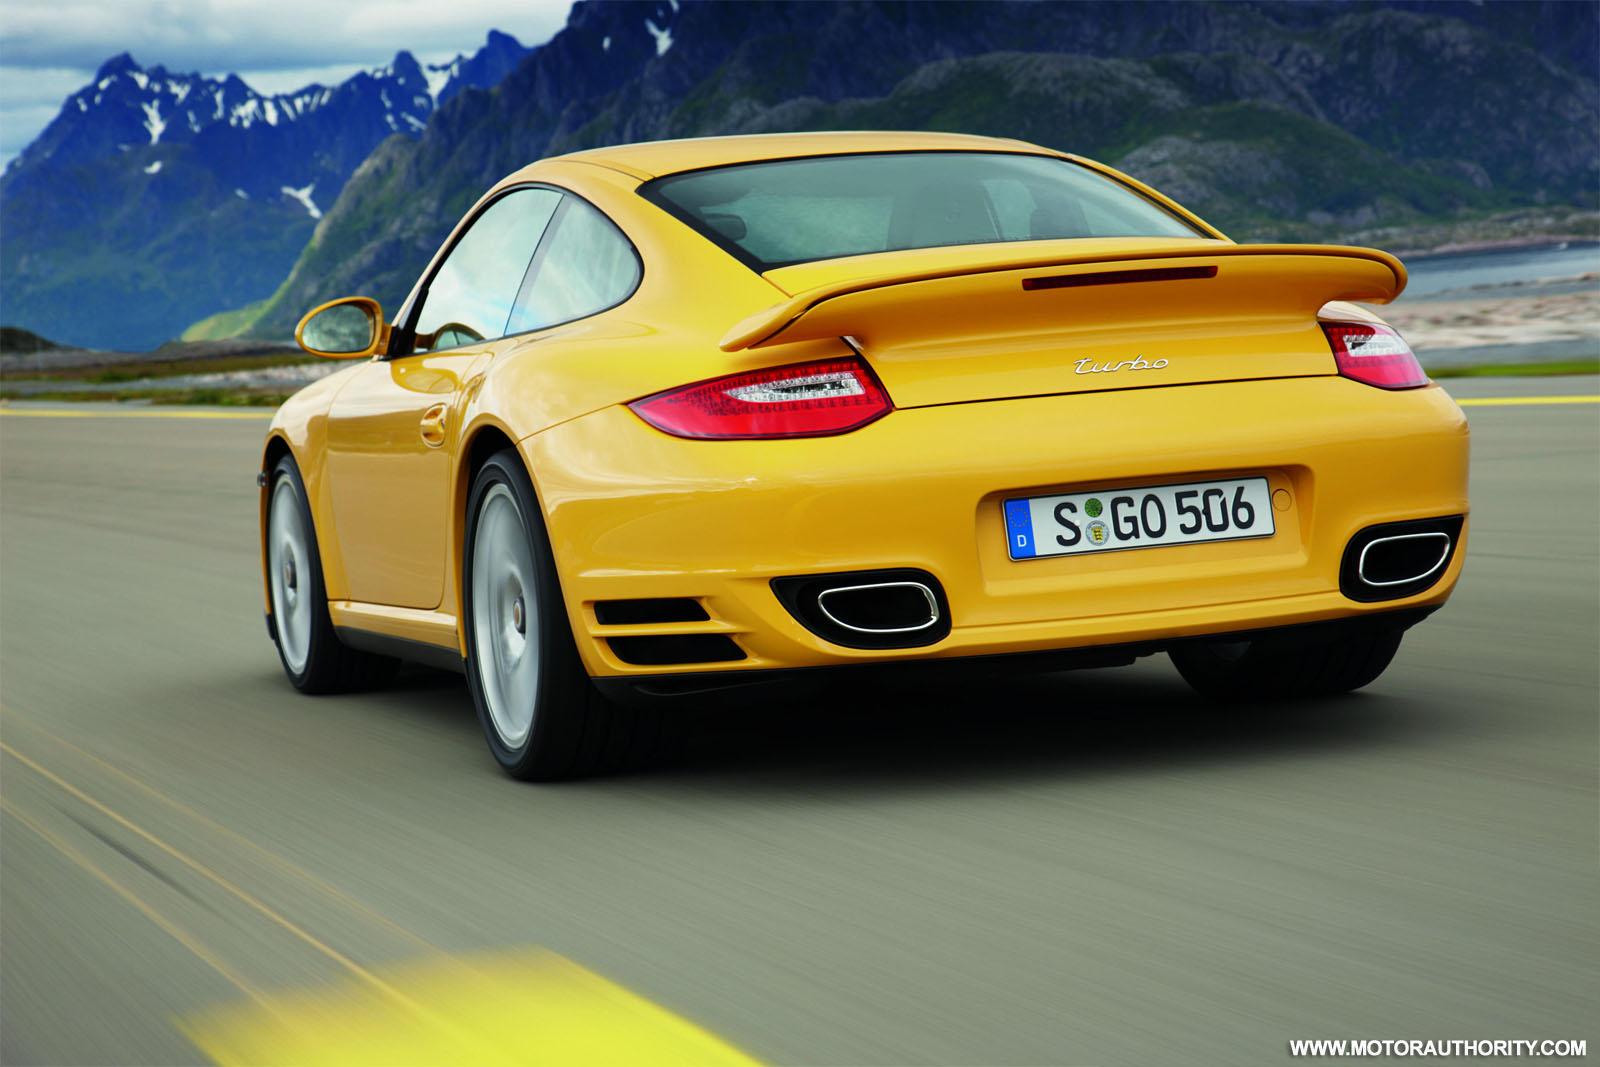 2010 porsche 911 turbo shaves 10 seconds off nurburgring lap time. Black Bedroom Furniture Sets. Home Design Ideas